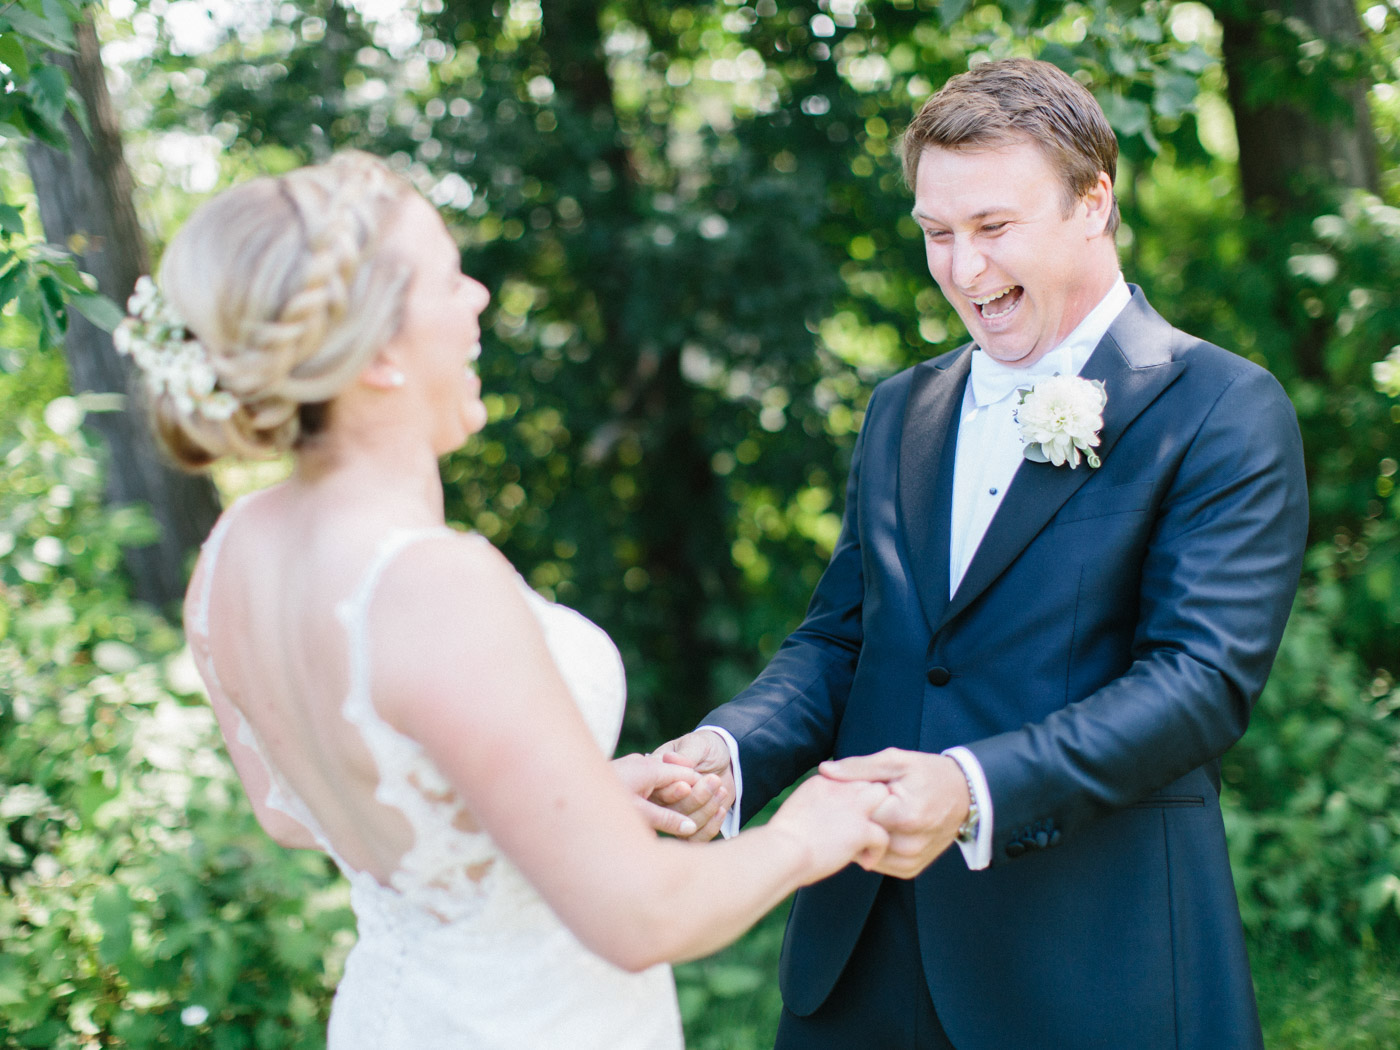 toronto_wedding_photographer_best_wedding_photography-15.jpg